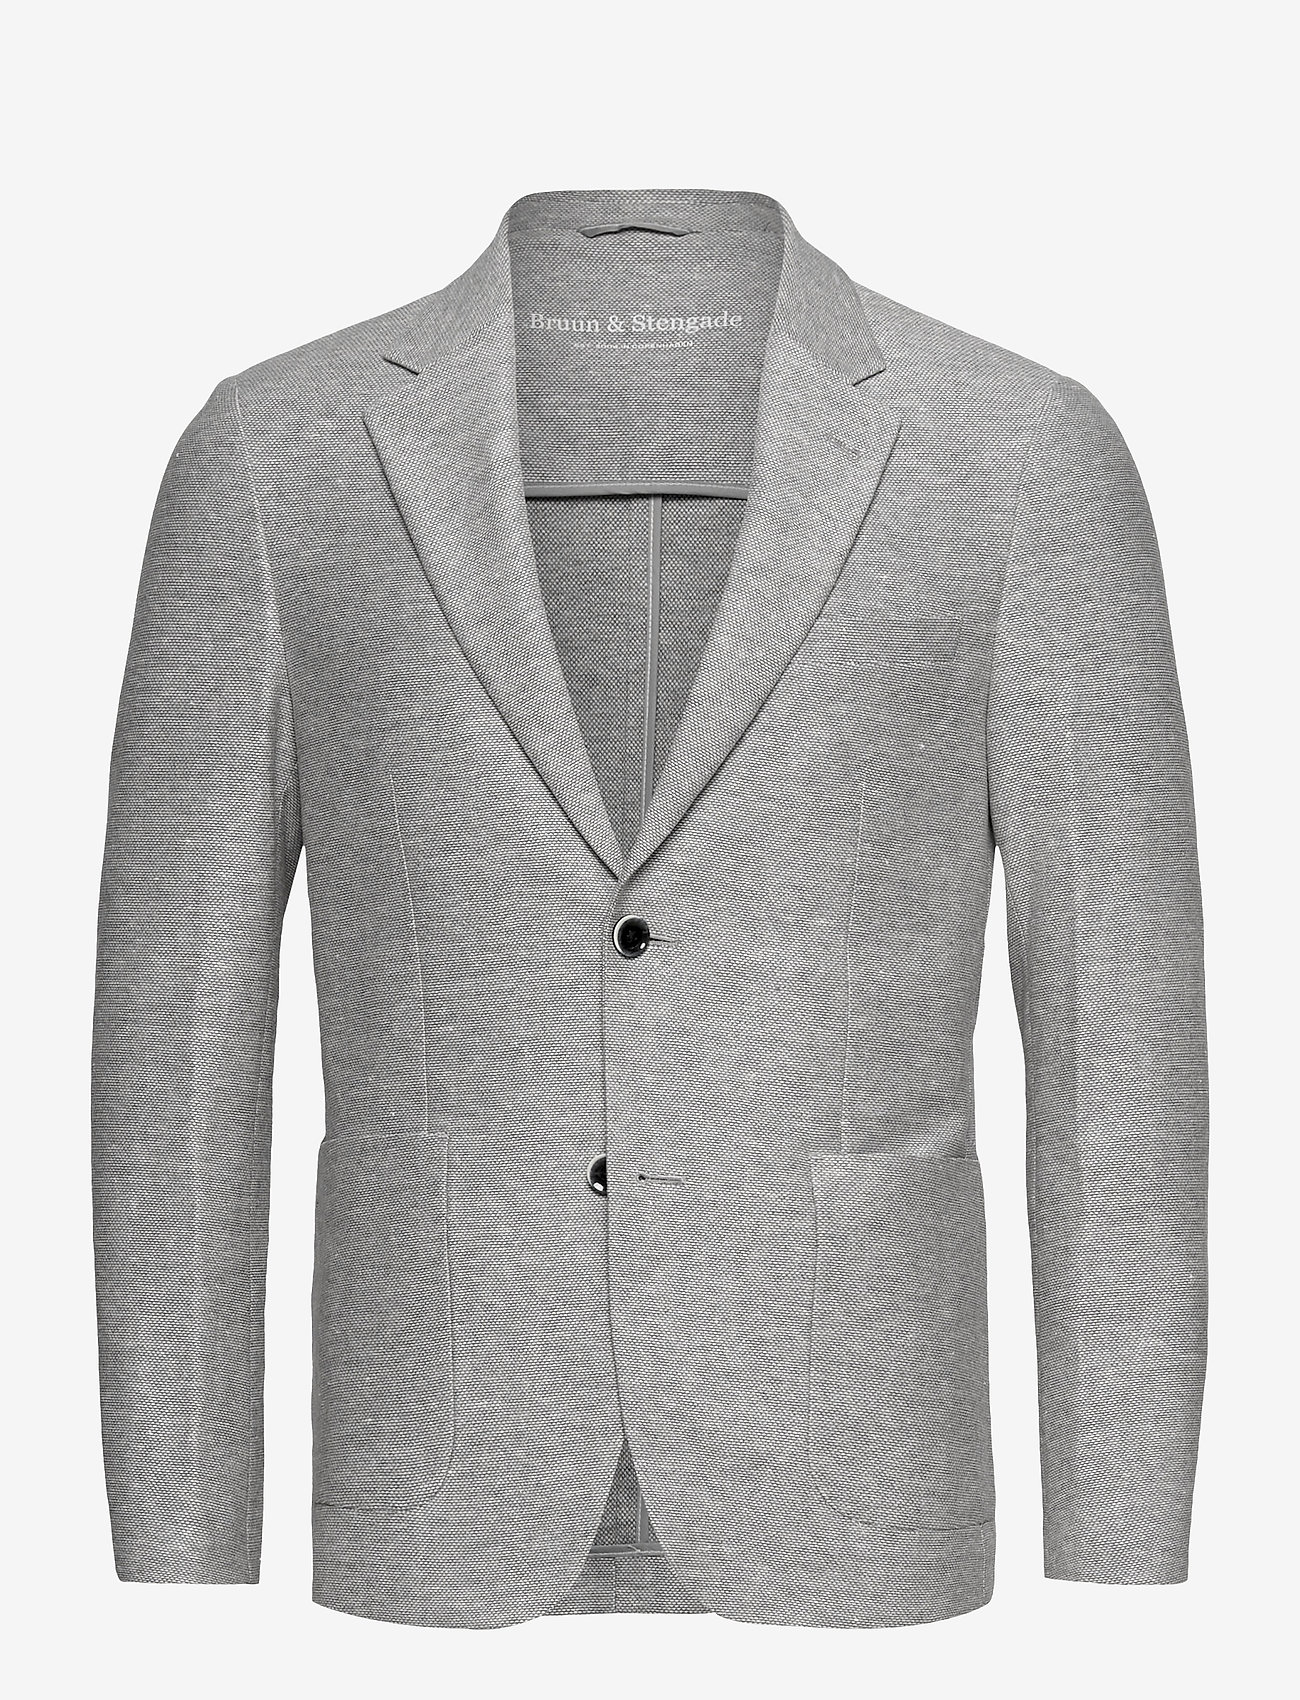 Bruun & Stengade - BS Barbaresco Tailored, Blazer - single breasted blazers - grey - 1